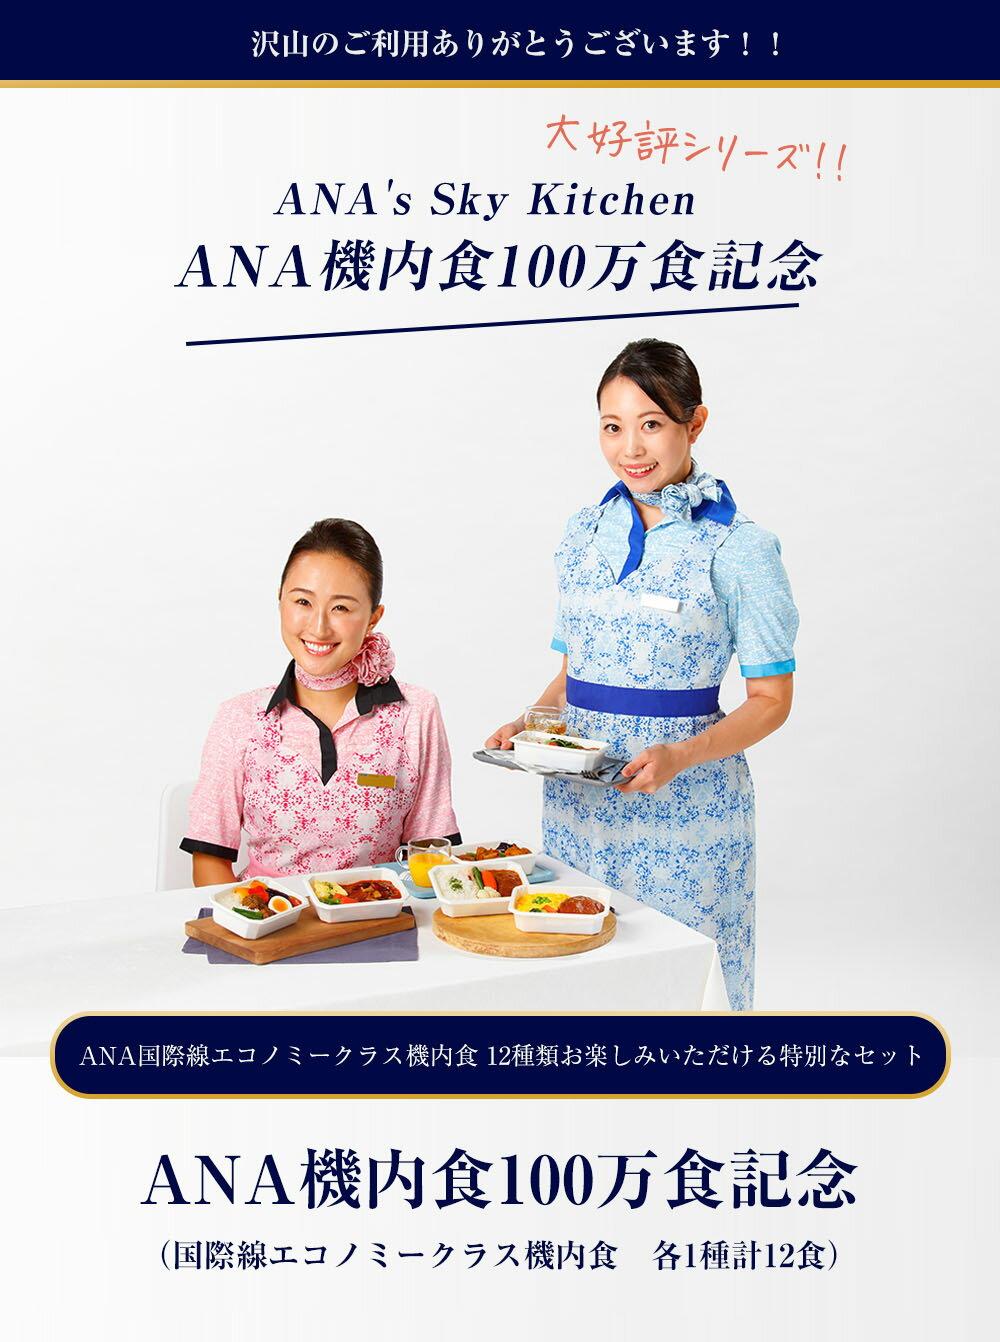 【ANA'sSkyKitchen】ANA機内食100万食記念(国際線エコノミークラス機内食各1種計12食)12個入り冷凍食品お弁当お取り寄せグルメ温めるだけ簡単時短洋食和食時短ごはんanaアナ